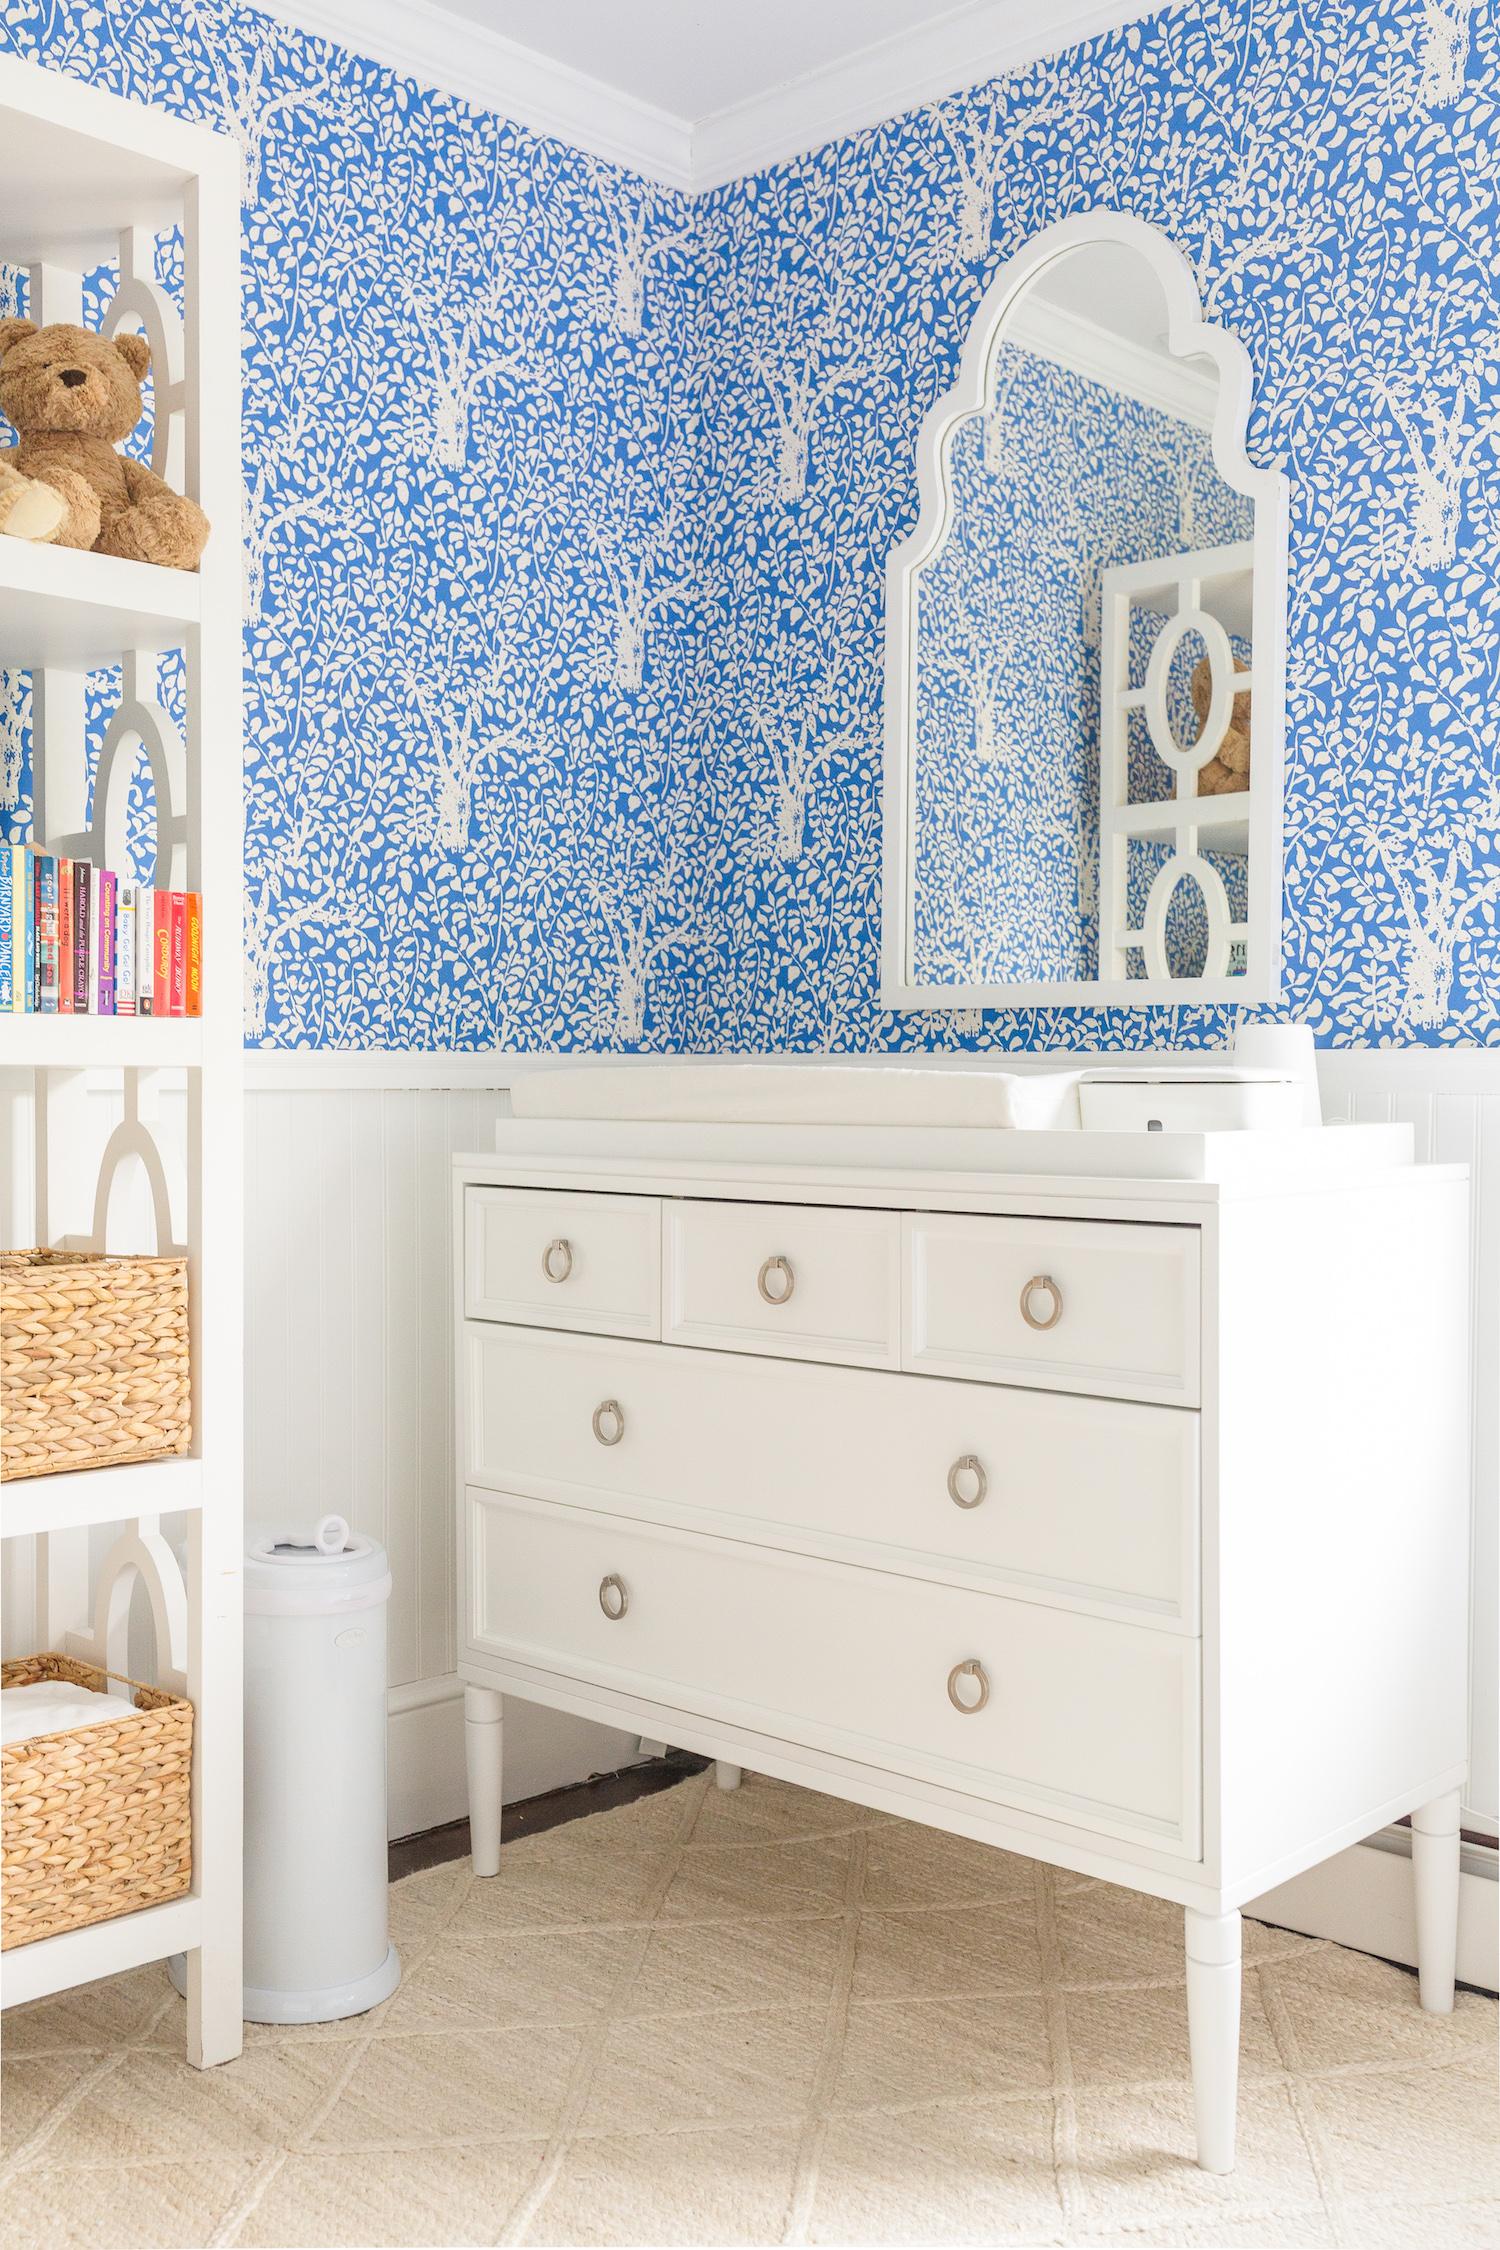 design darling nursery quadrille arbre de matisse reverse wallpaper china blue one kings lane myrna wall mirror ducduc savannah 5 drawer changer